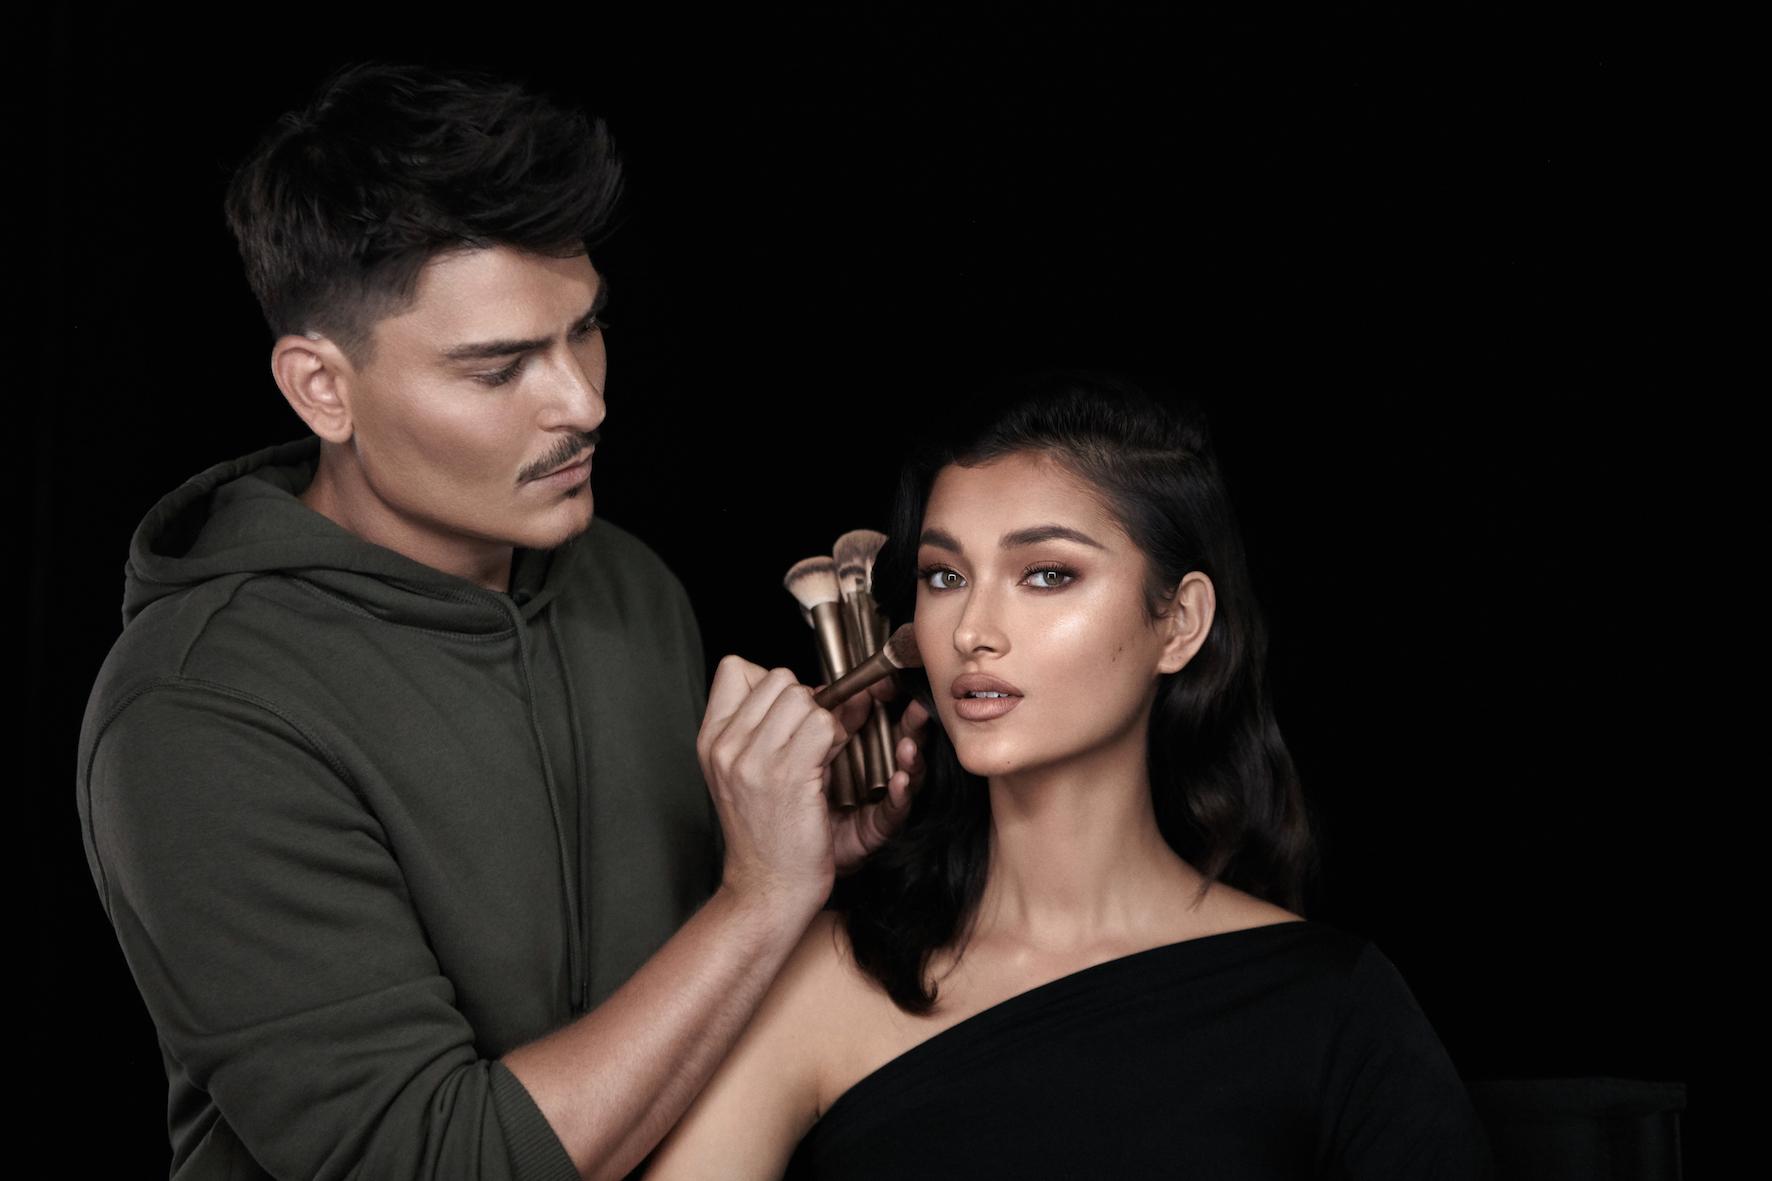 BlogStar: Makeup by Mario x Sephora - BlogStar.pl